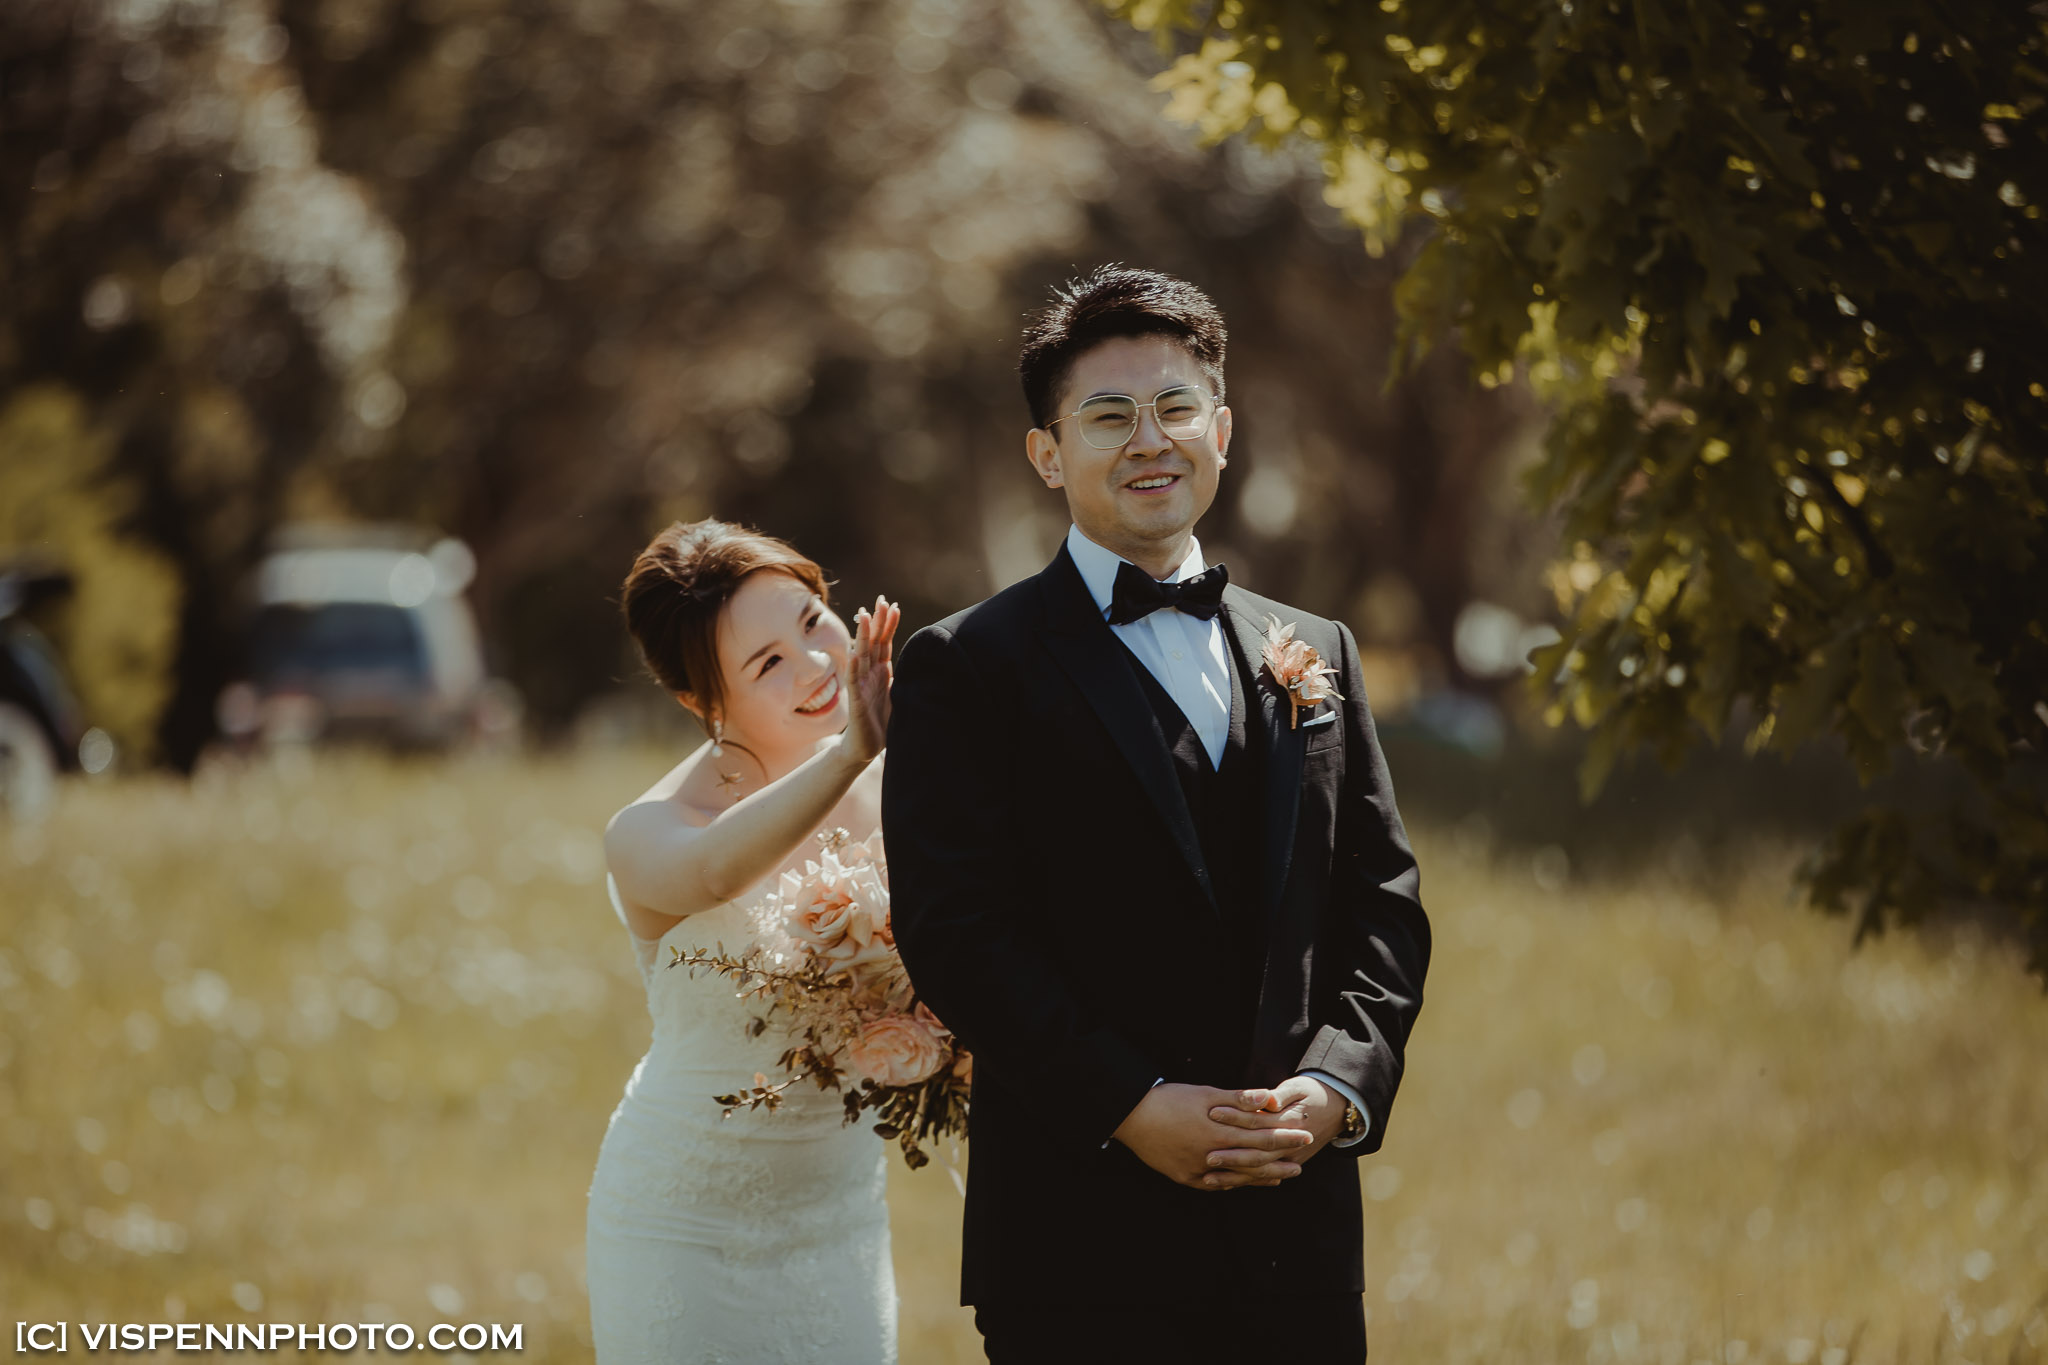 WEDDING DAY Photography Melbourne VISPENN 墨尔本 婚礼跟拍 婚礼摄像 婚礼摄影 结婚照 登记照 ElitaPB 05429 2P 1DX2 VISPENN